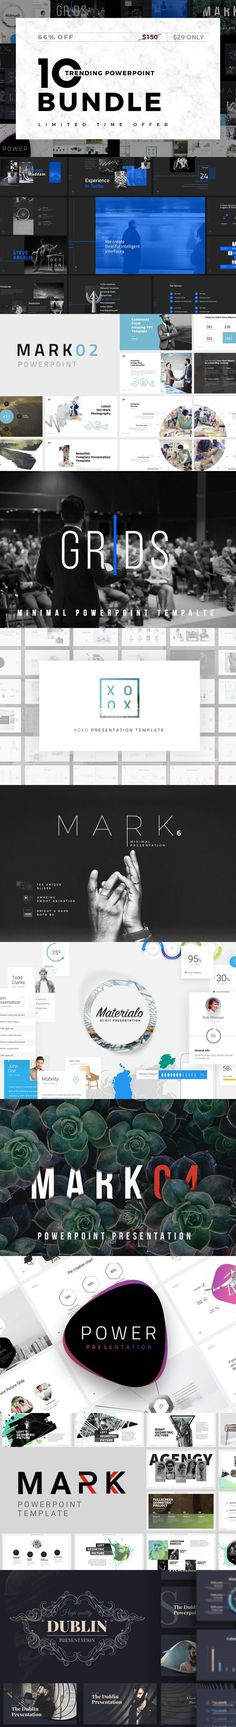 Trending-Minimal Powerpoint Bundle. Graphic Design Infographics. $29.00